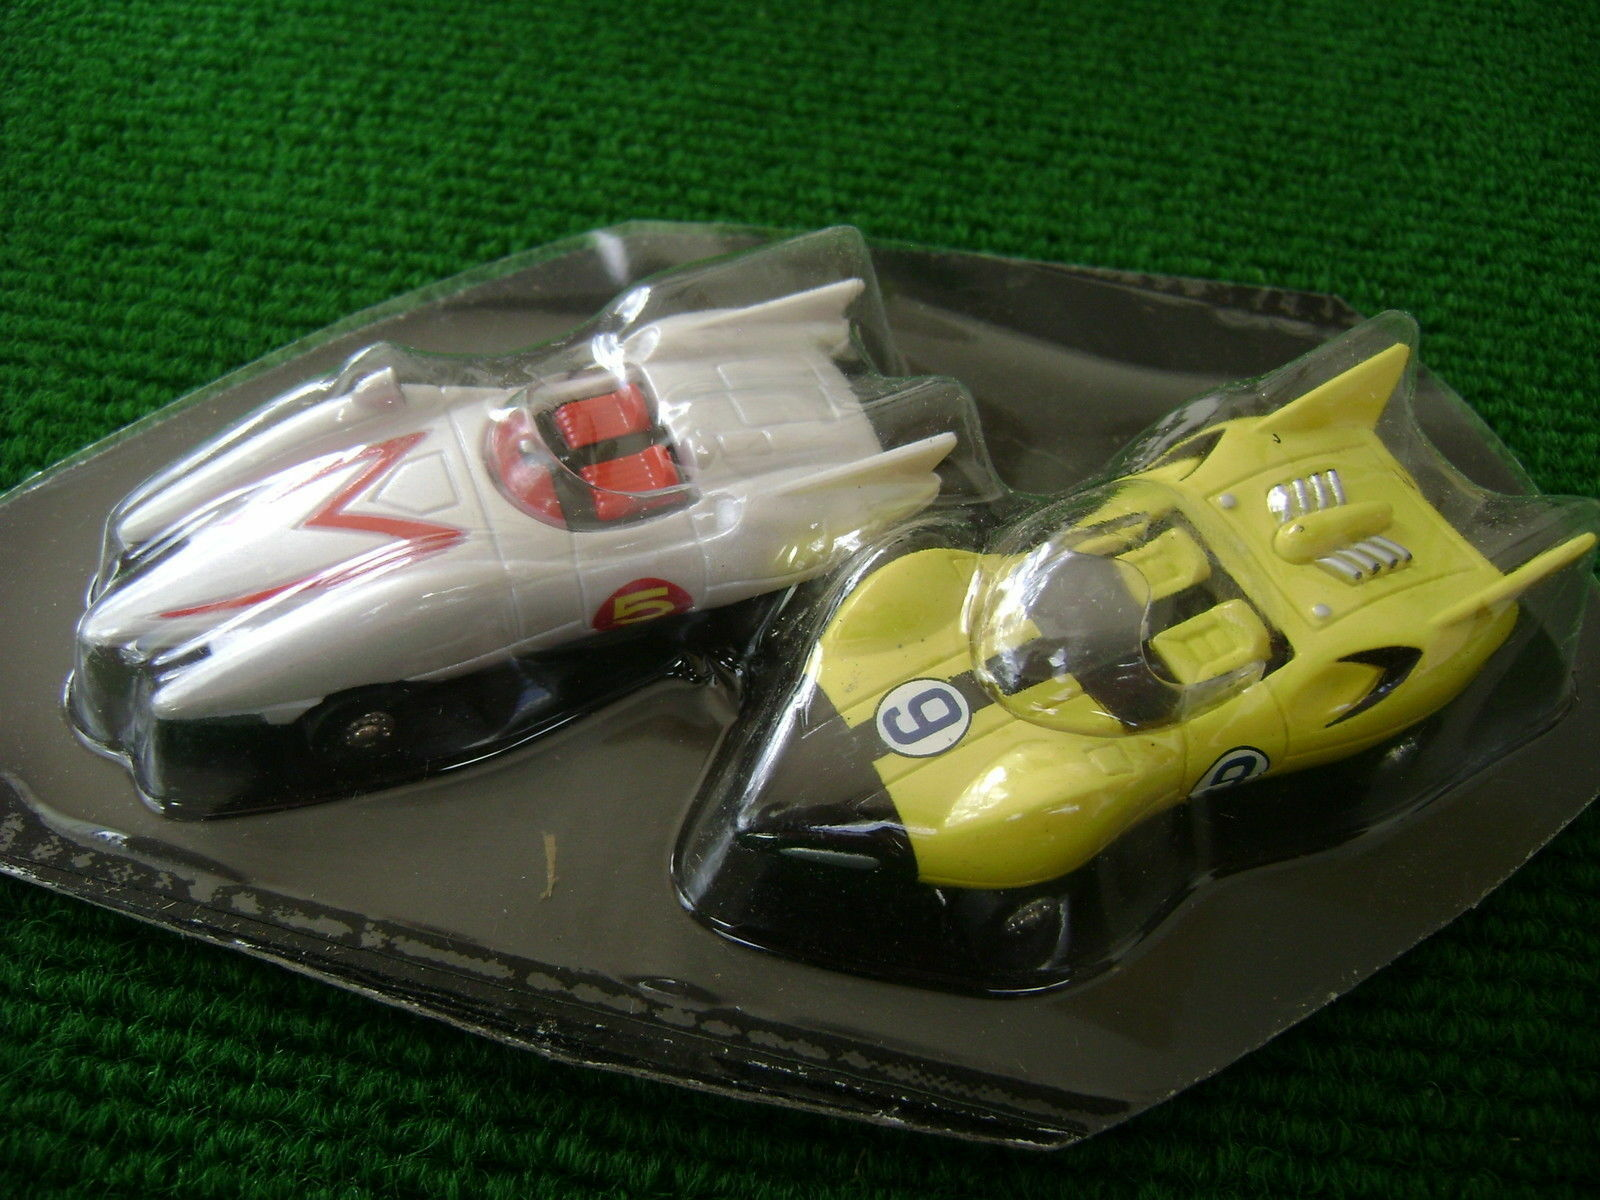 AW deux RARE NEW Auto World Speed Racer Ultra G Set voitures ho slot car Fit Aurora